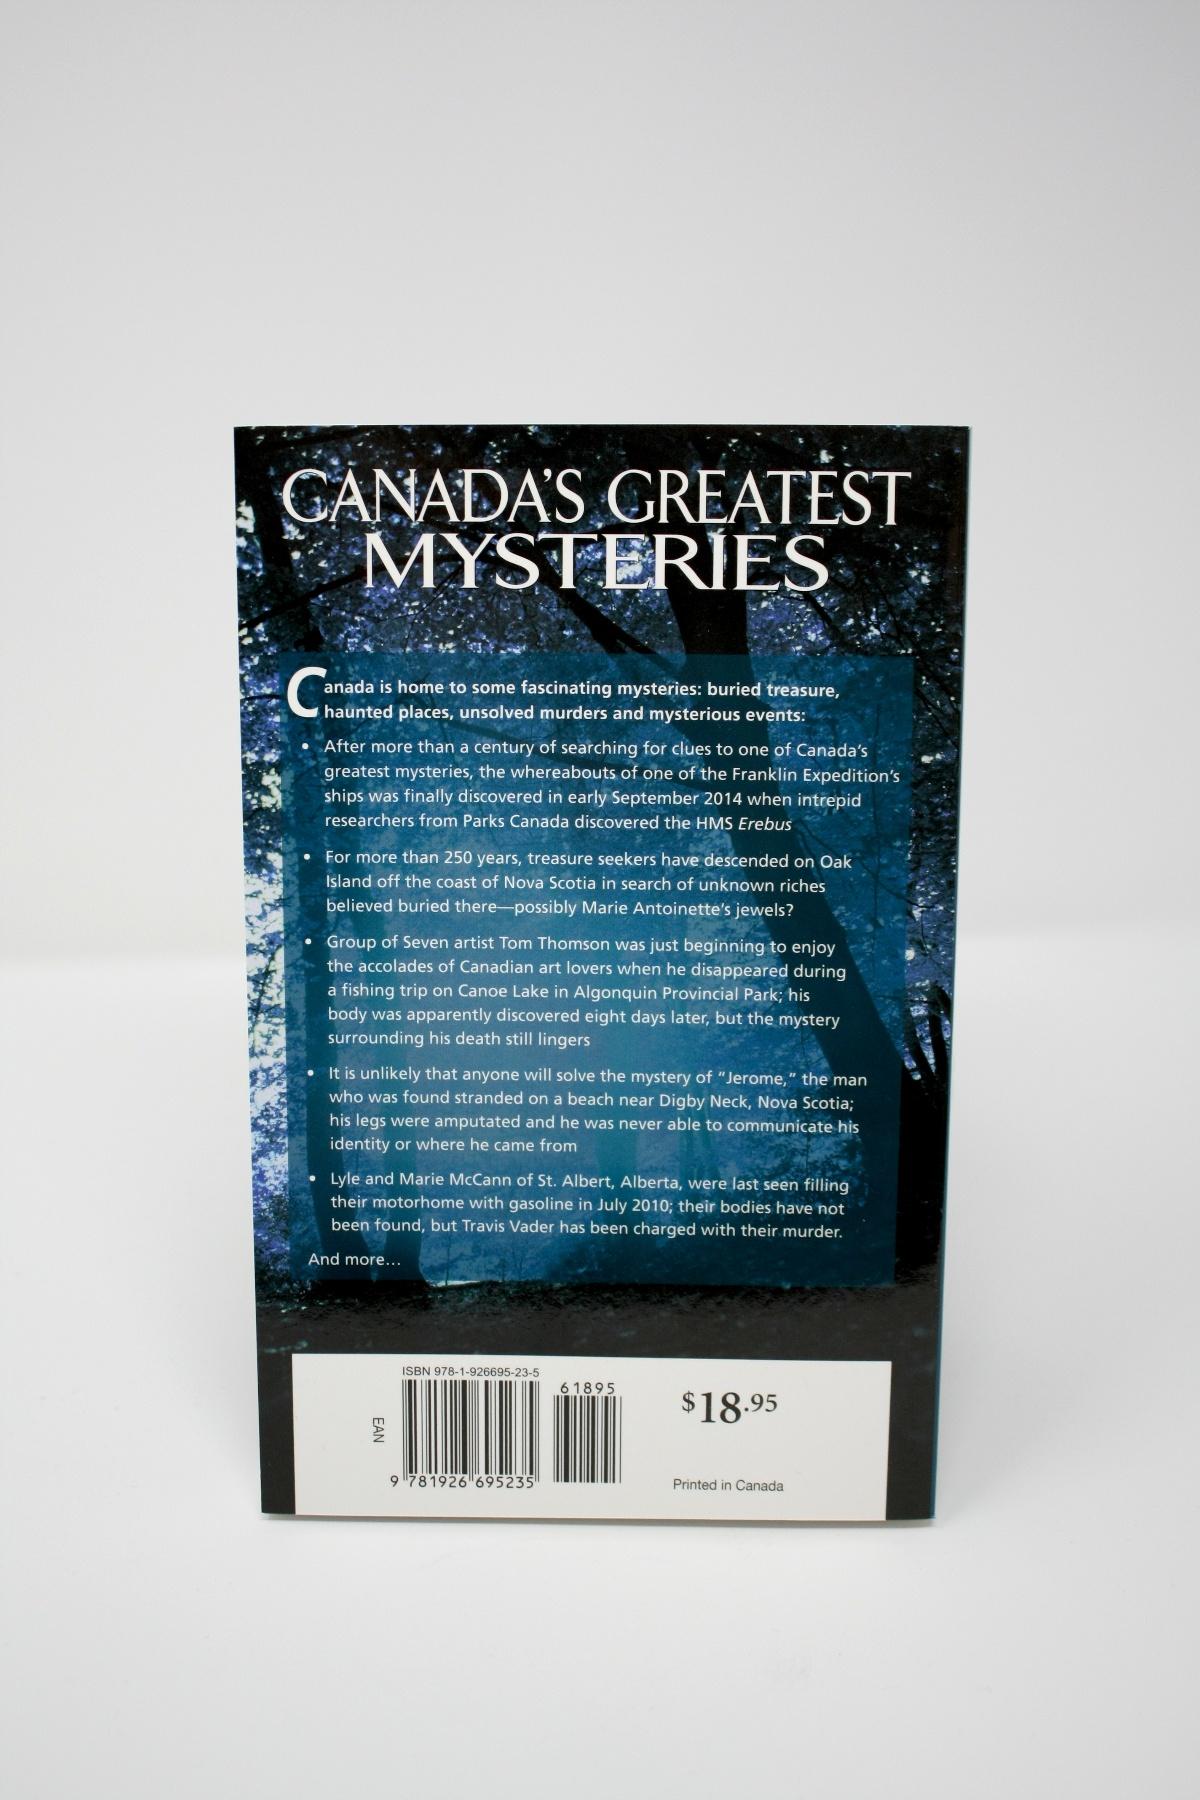 galaxys greatest mysteries - HD1200×1800